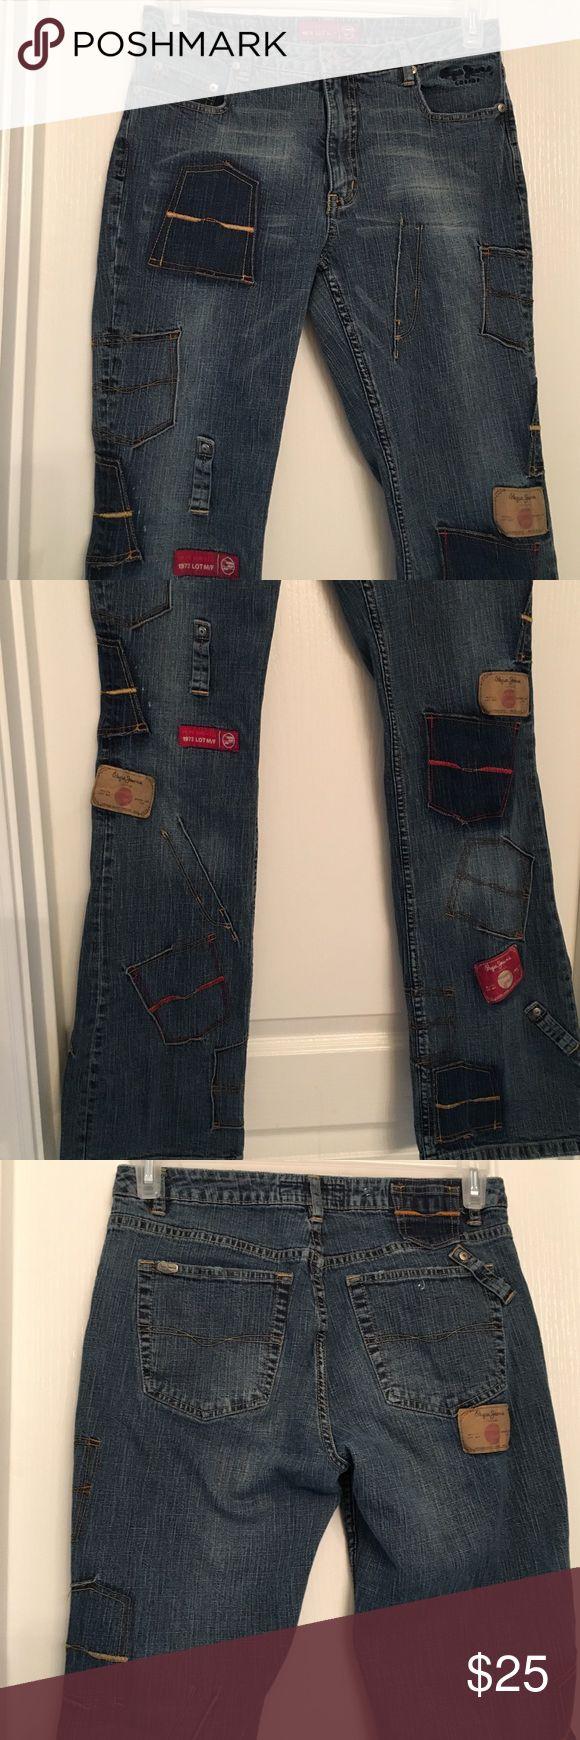 Spotted while shopping on Poshmark: Pepe (UK) ltd. 1973 Lot M/F jeans!!!! #poshmark #fashion #shopping #style #Pepe Jeans #Denim